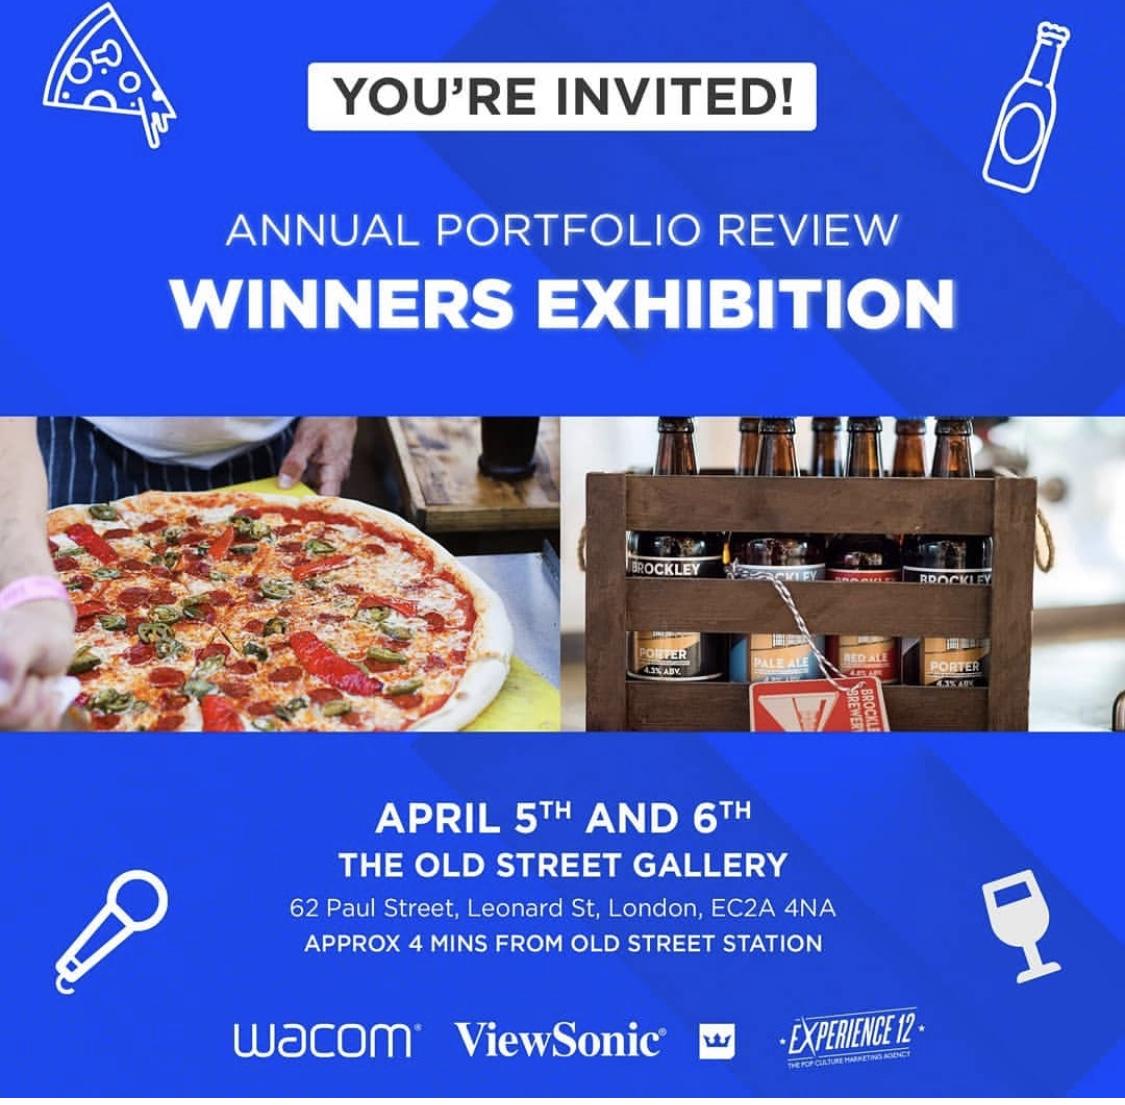 Creative exhibition